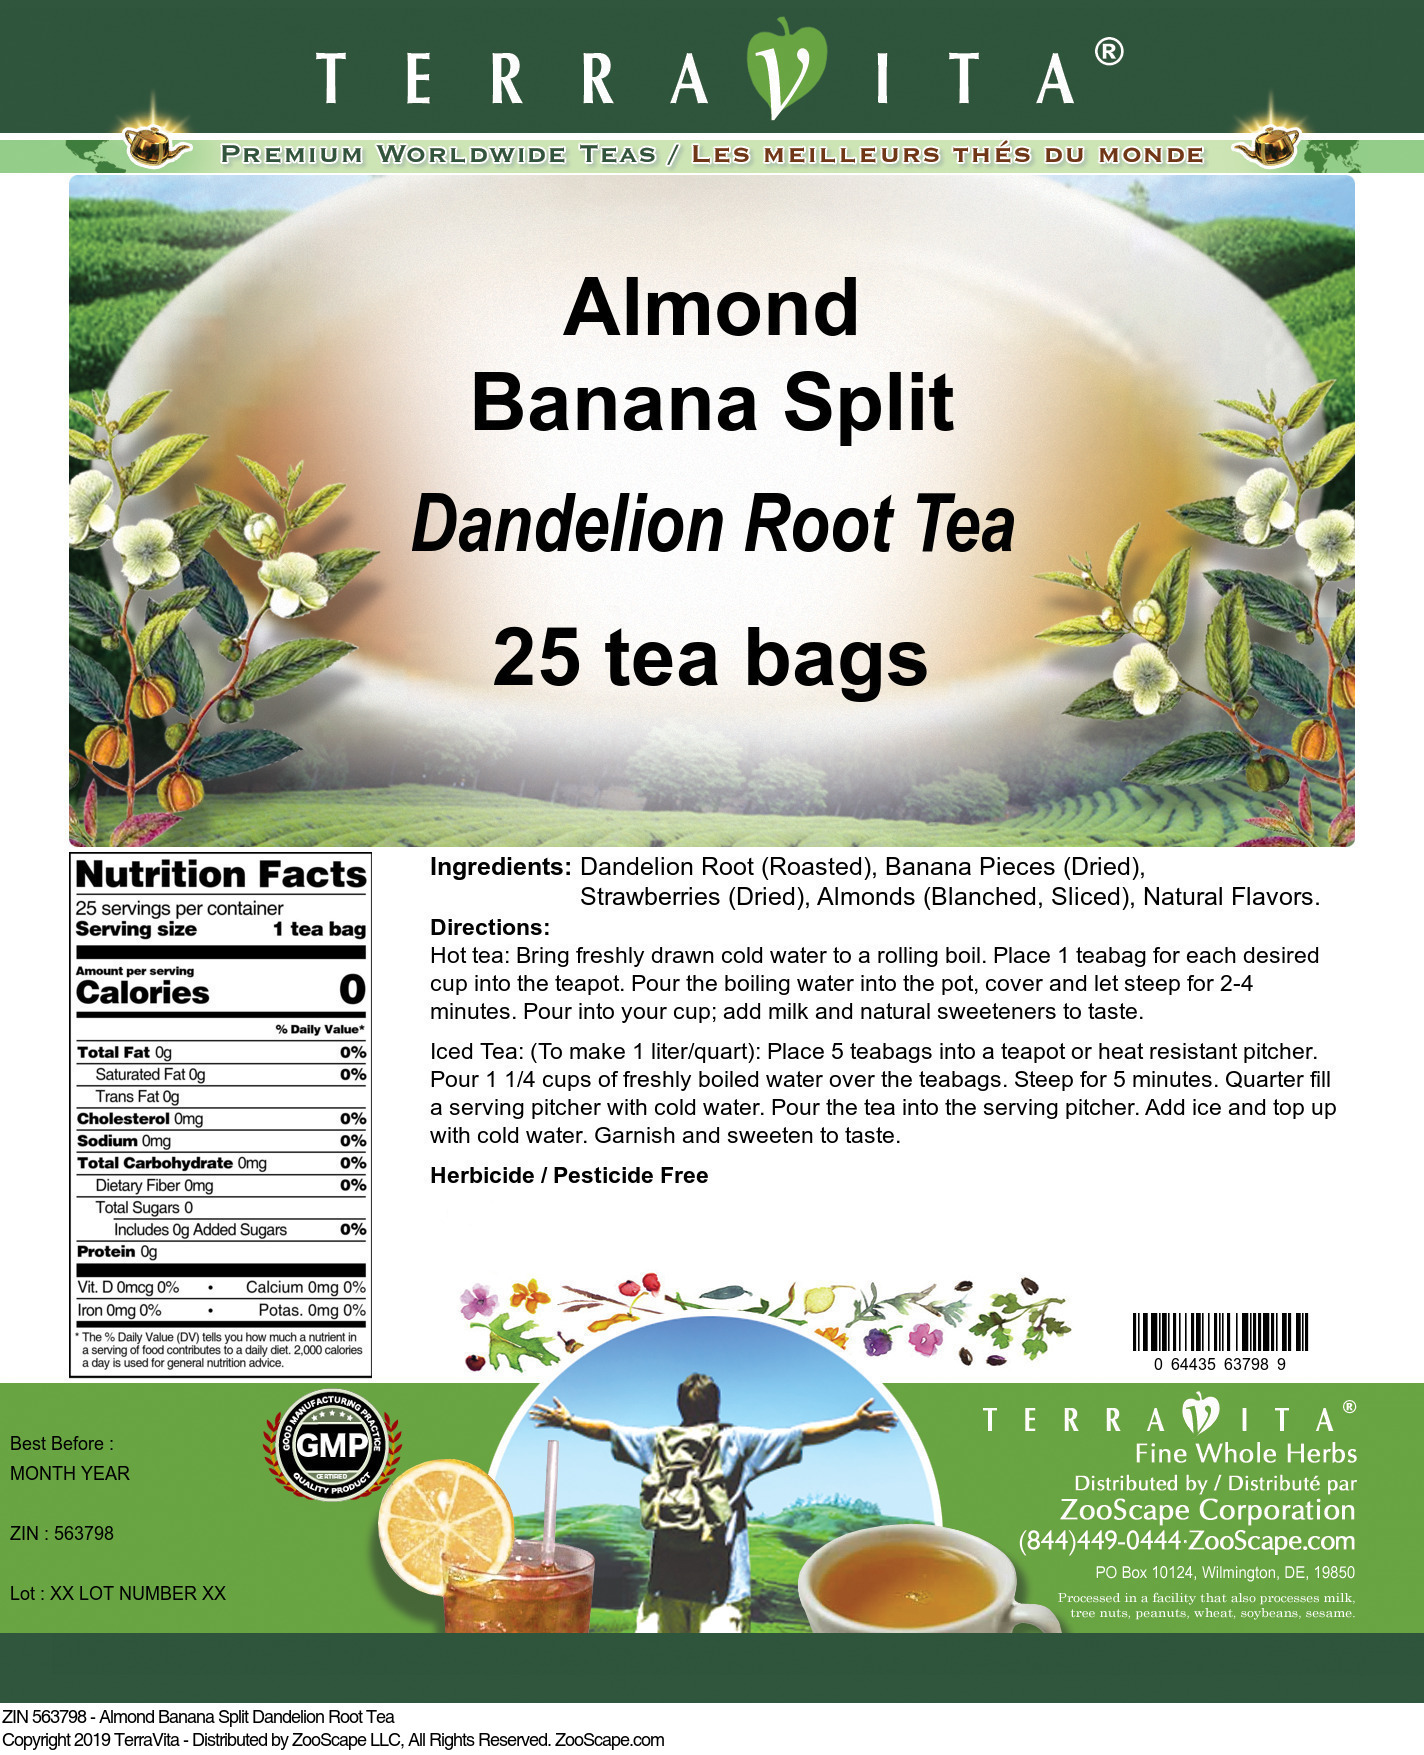 Almond Banana Split Dandelion Root